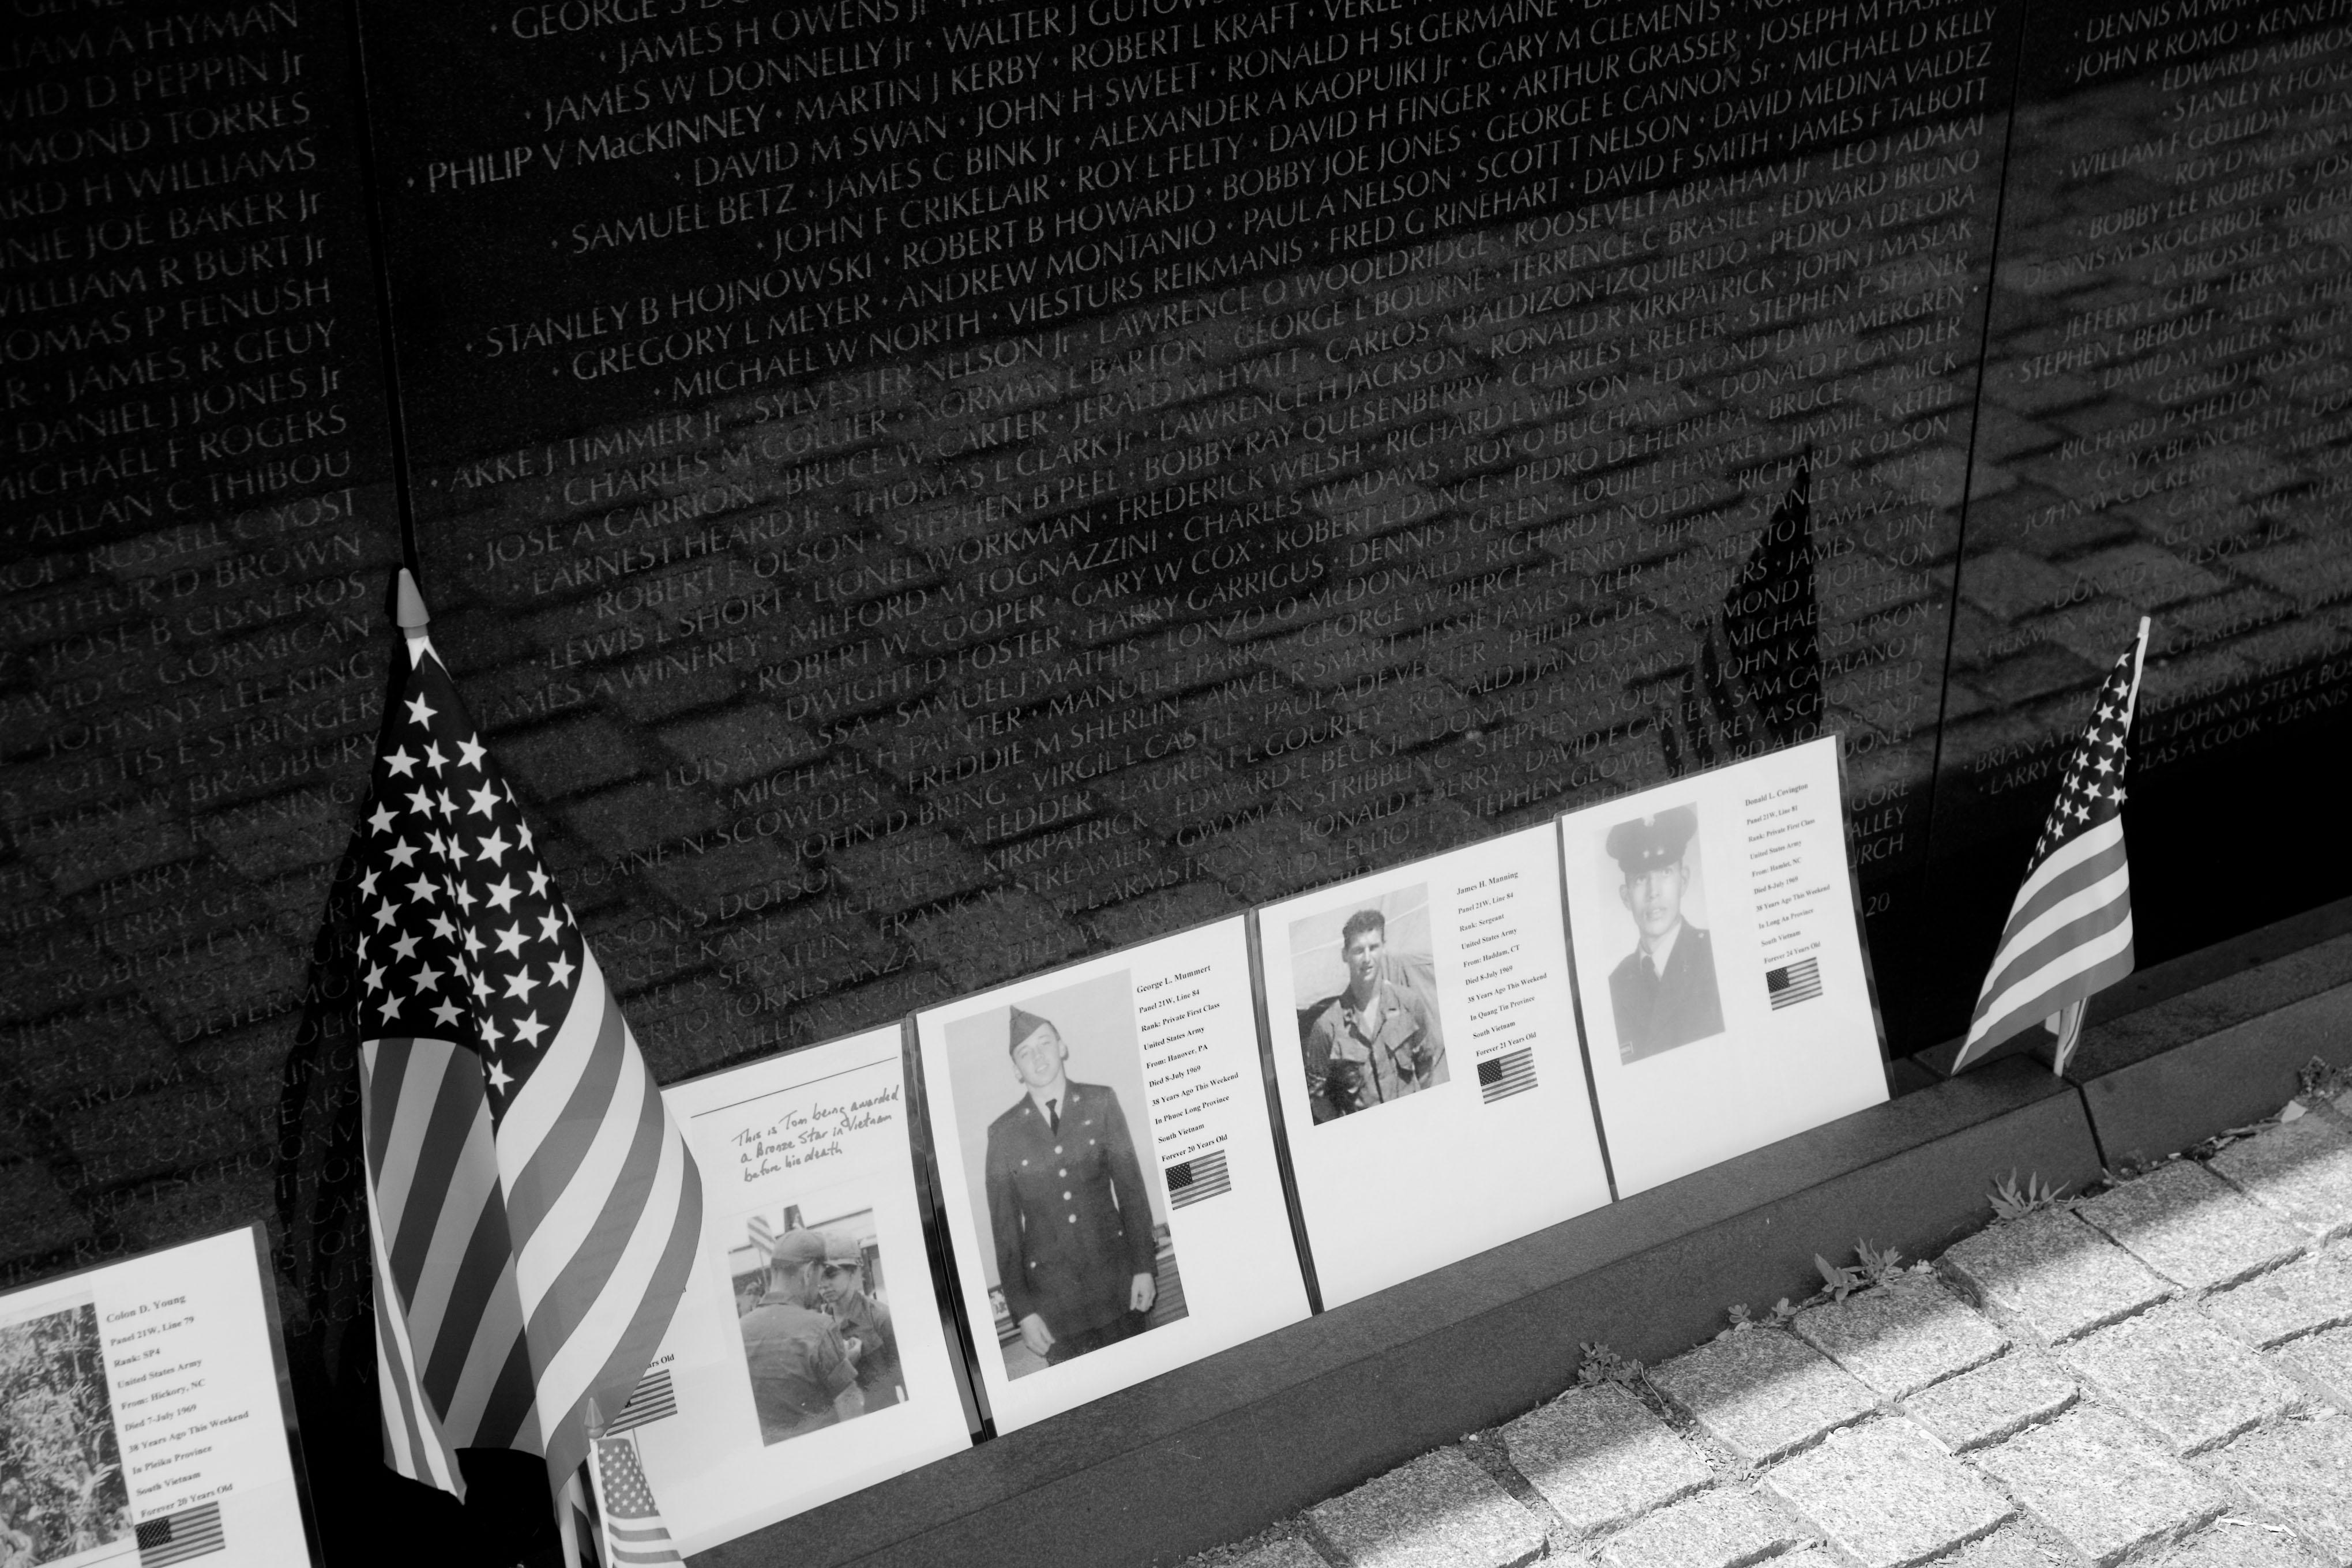 Vietnam War Memorial Washington File:vietnam War Memorial.jpg